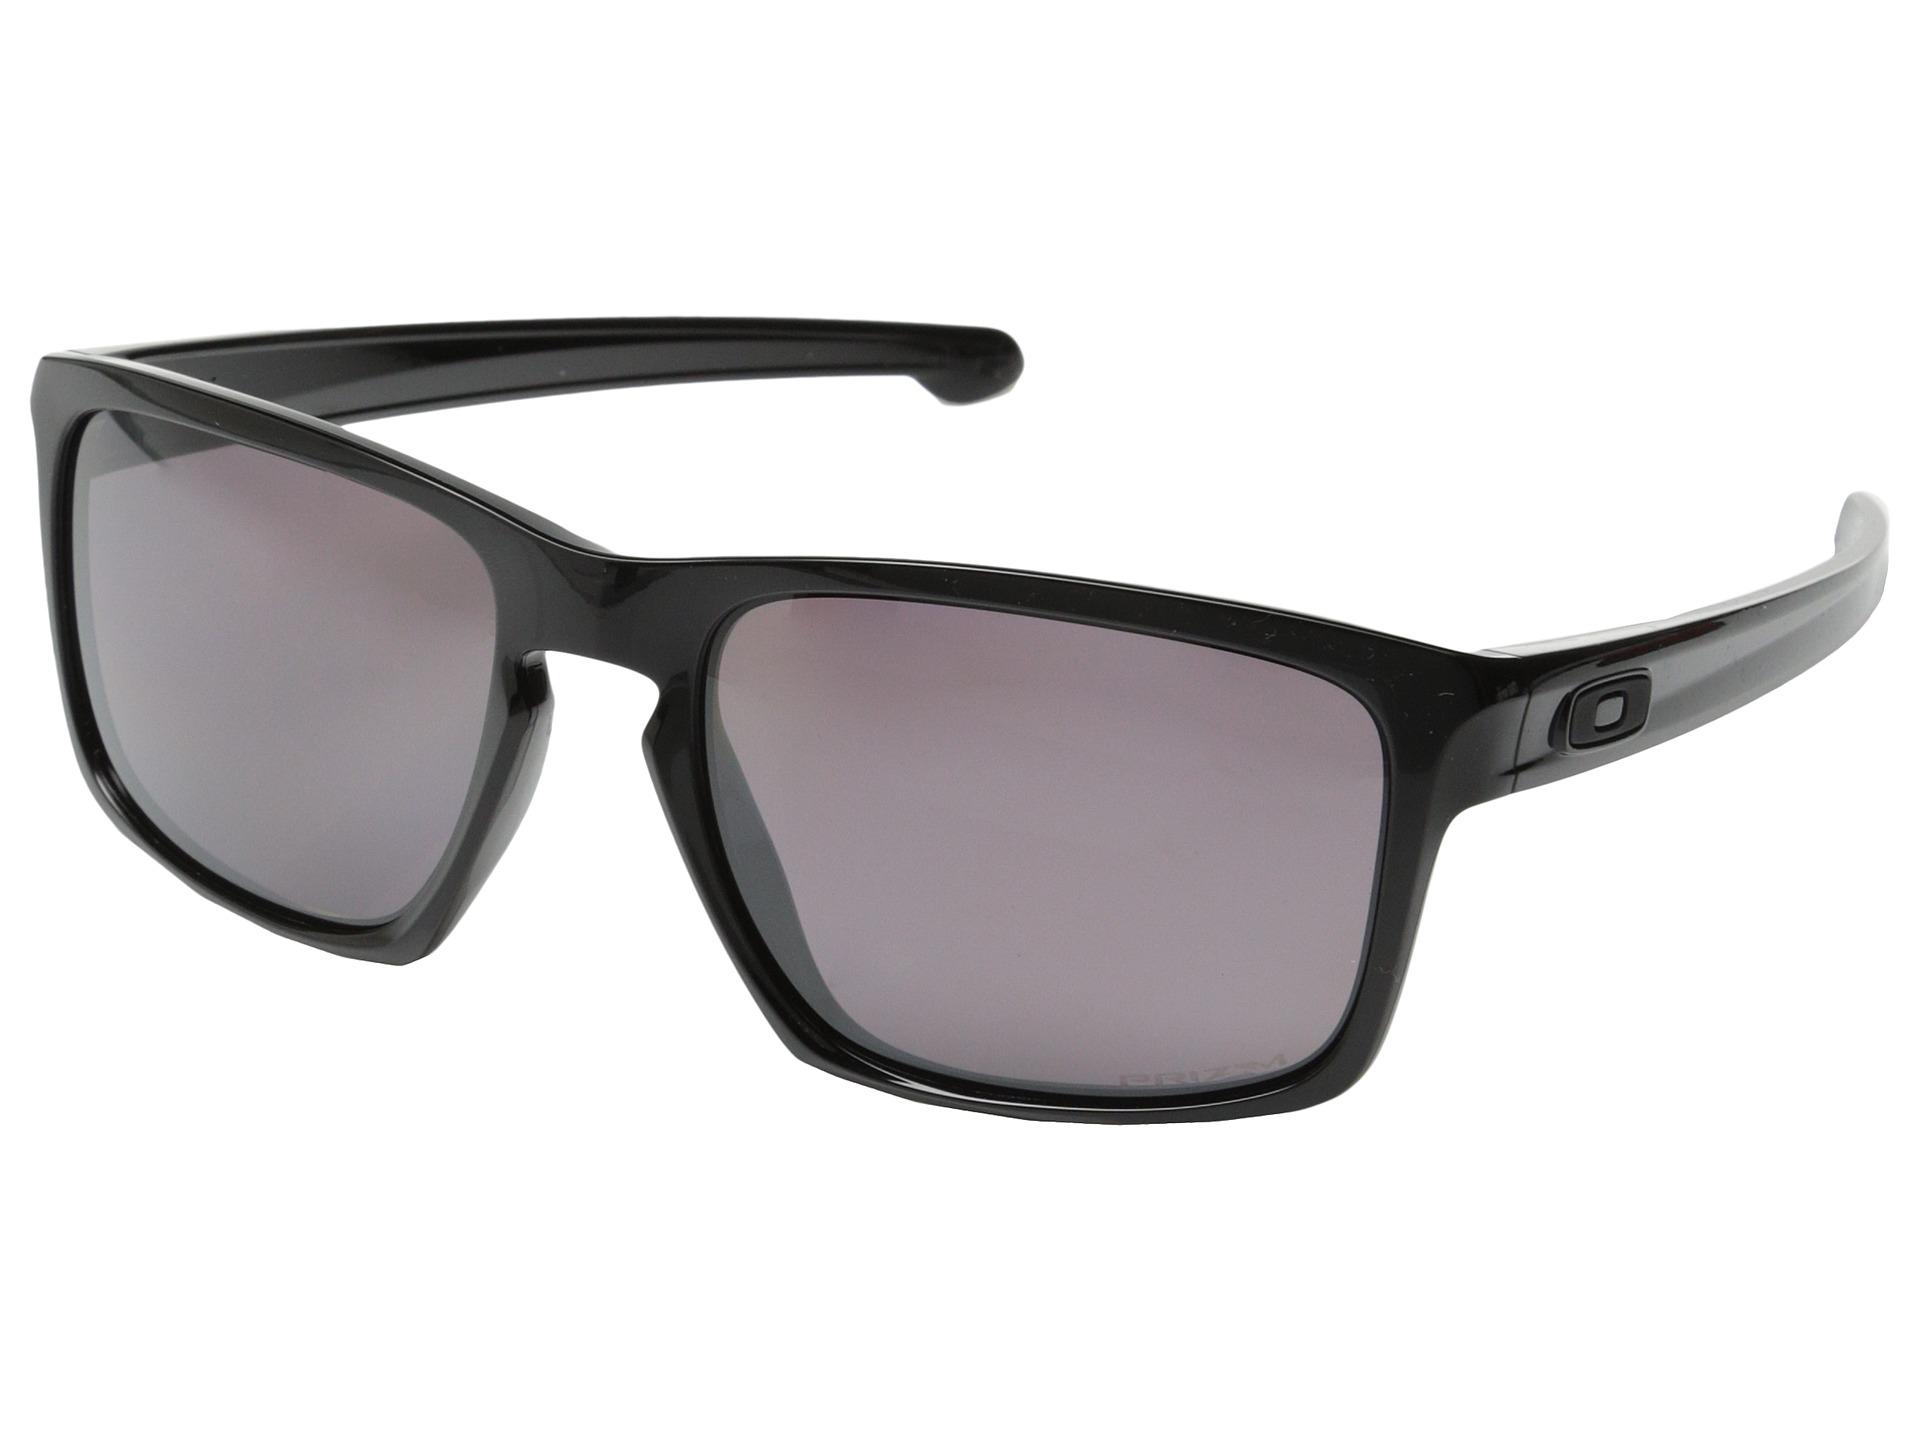 e05dee057b1 Oakley Sliver Polished Black Prizm Daily Polarized - slevi1.mit.edu Free  Shipping